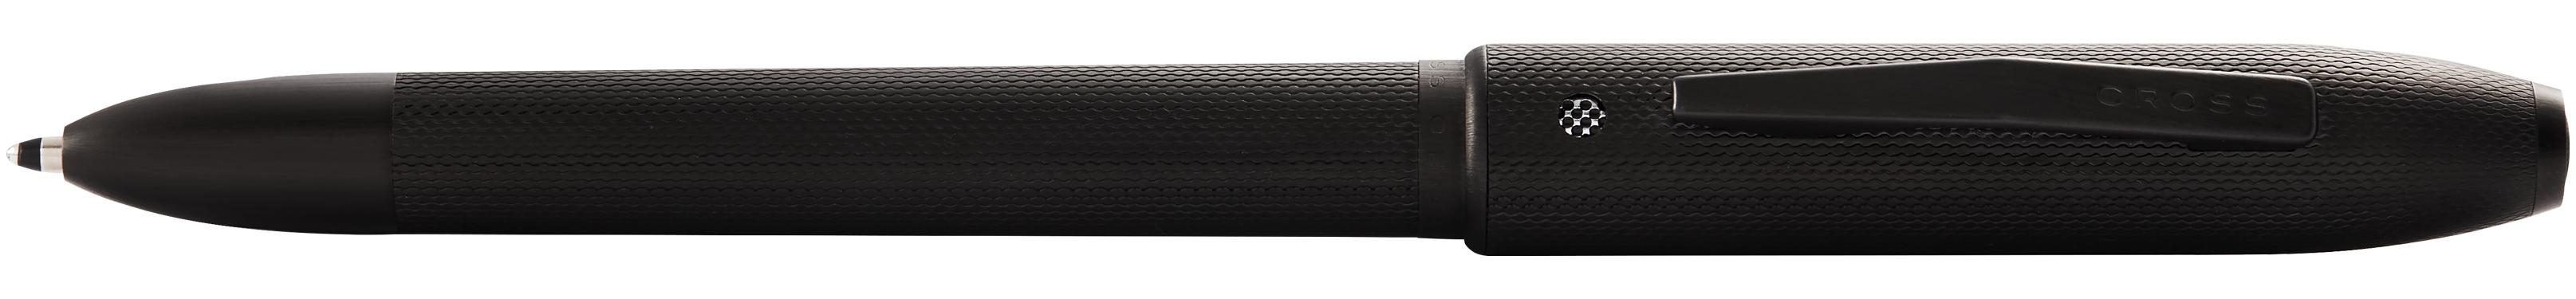 Tech4 Black PVD Multifunction Pen